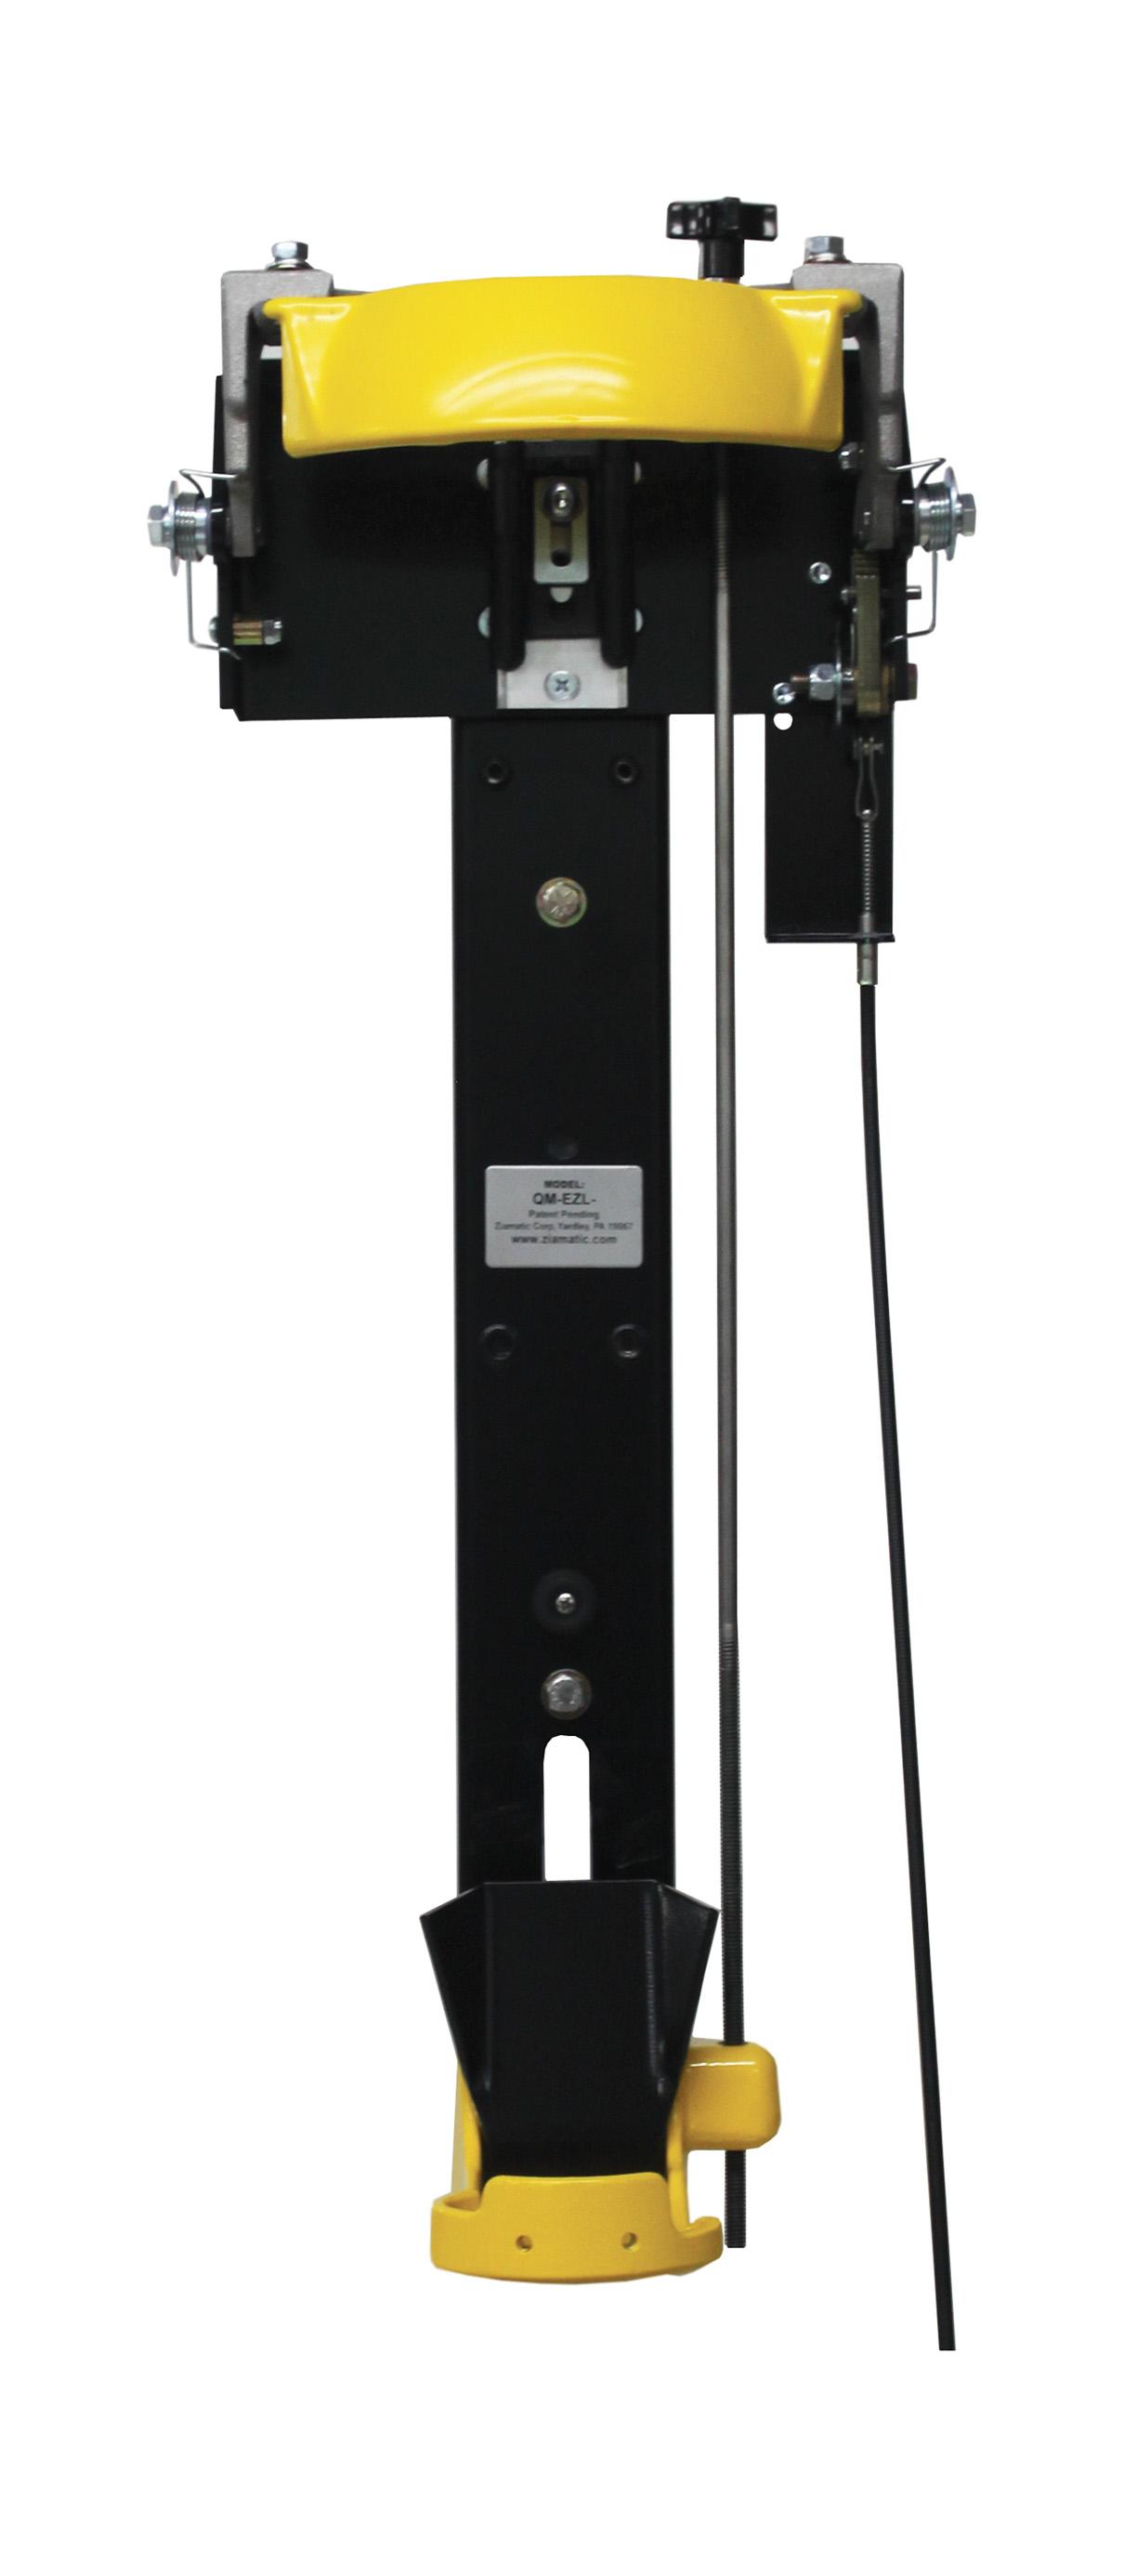 EZ-LOC Mechanical Bracket w/ Adjustable Top Clamp